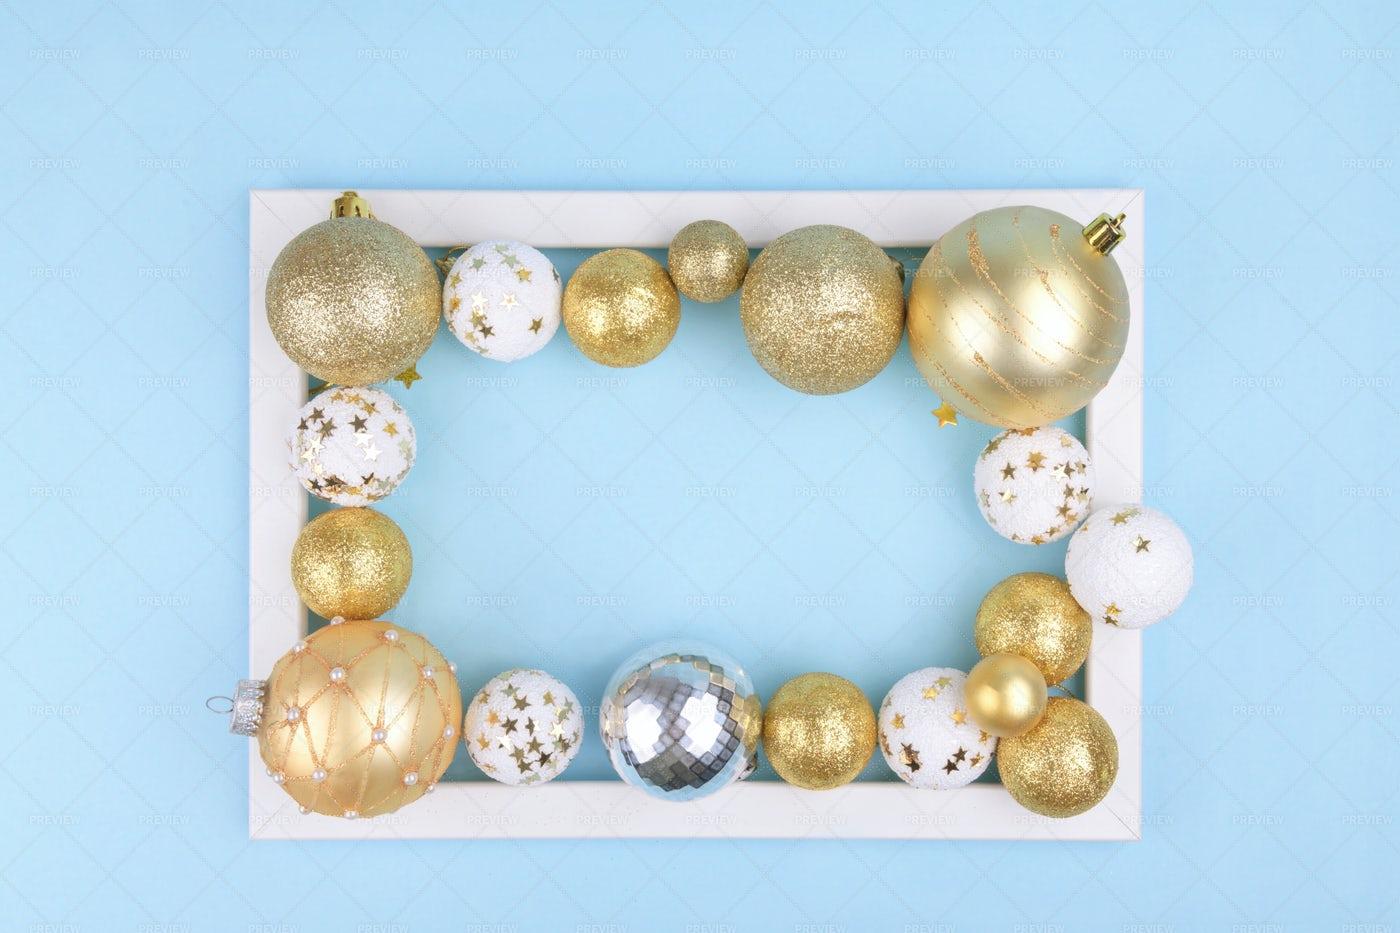 Gold And White Christmas Frame: Stock Photos